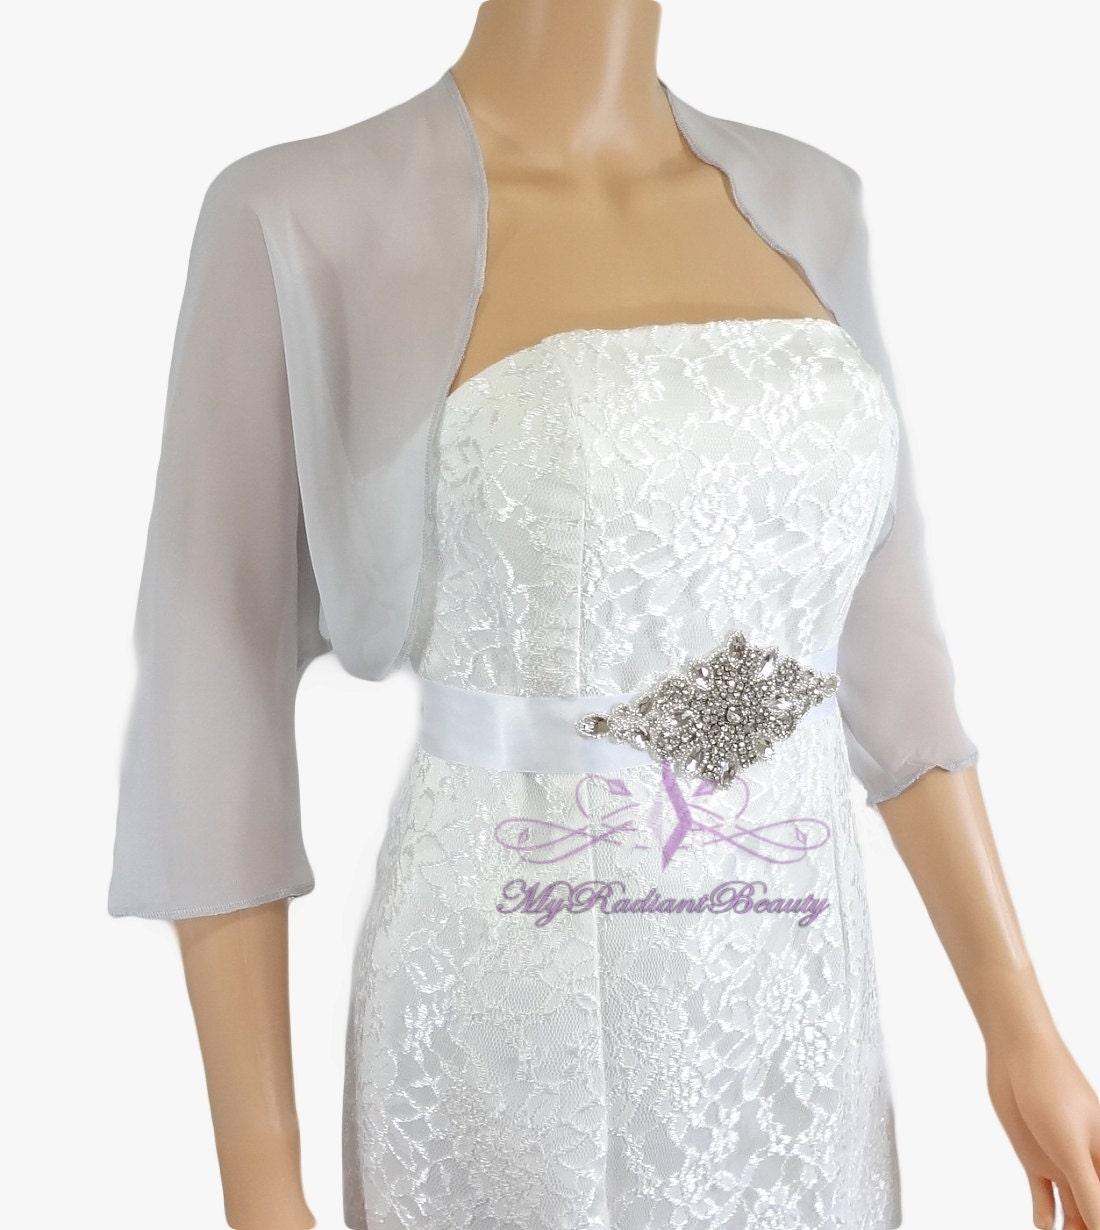 chiffon wedding bolero jacket wedding dresses asian. Black Bedroom Furniture Sets. Home Design Ideas